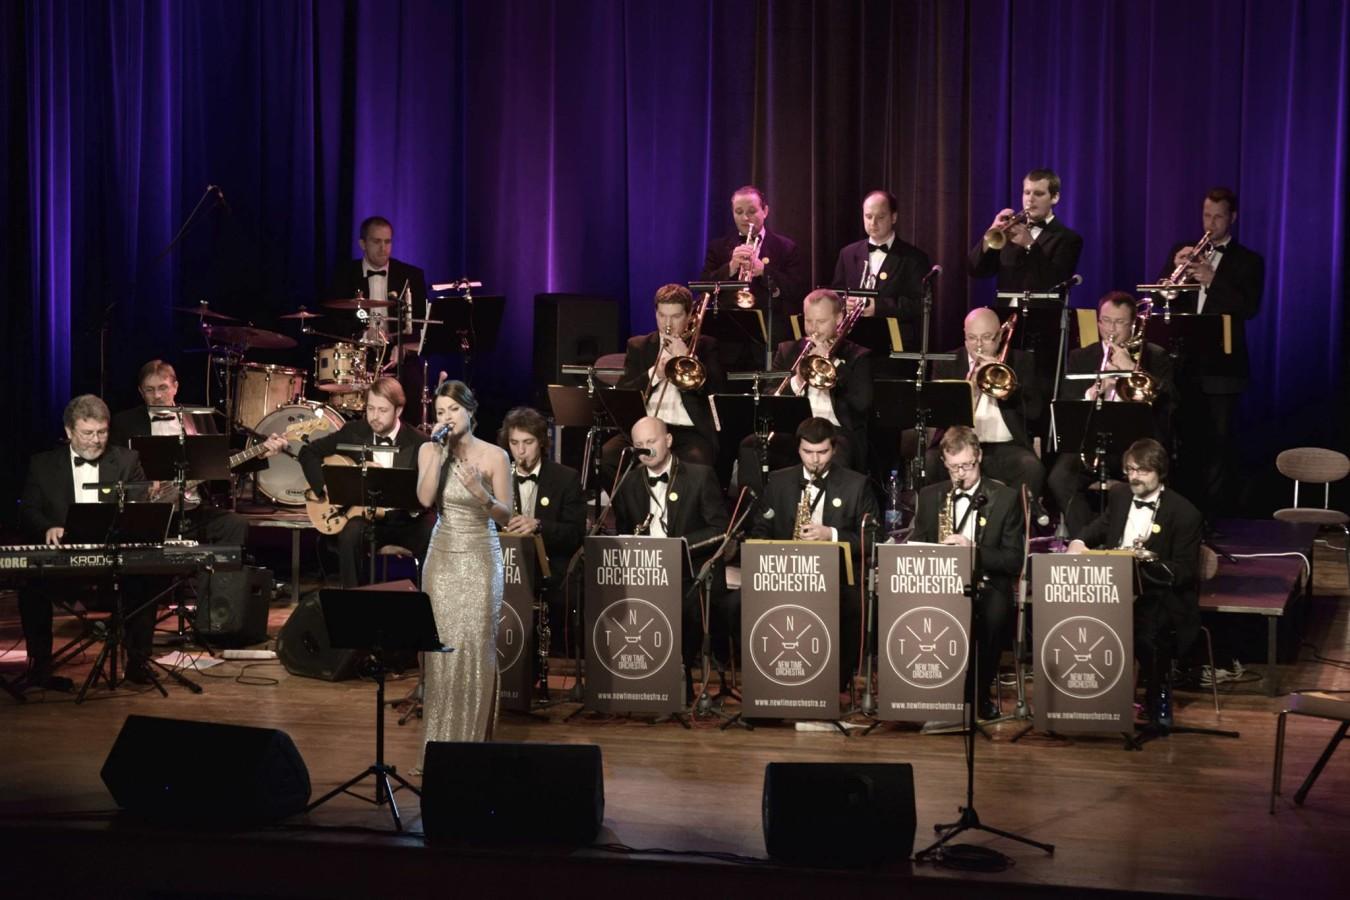 brno big band, big band brno, new time orchestra